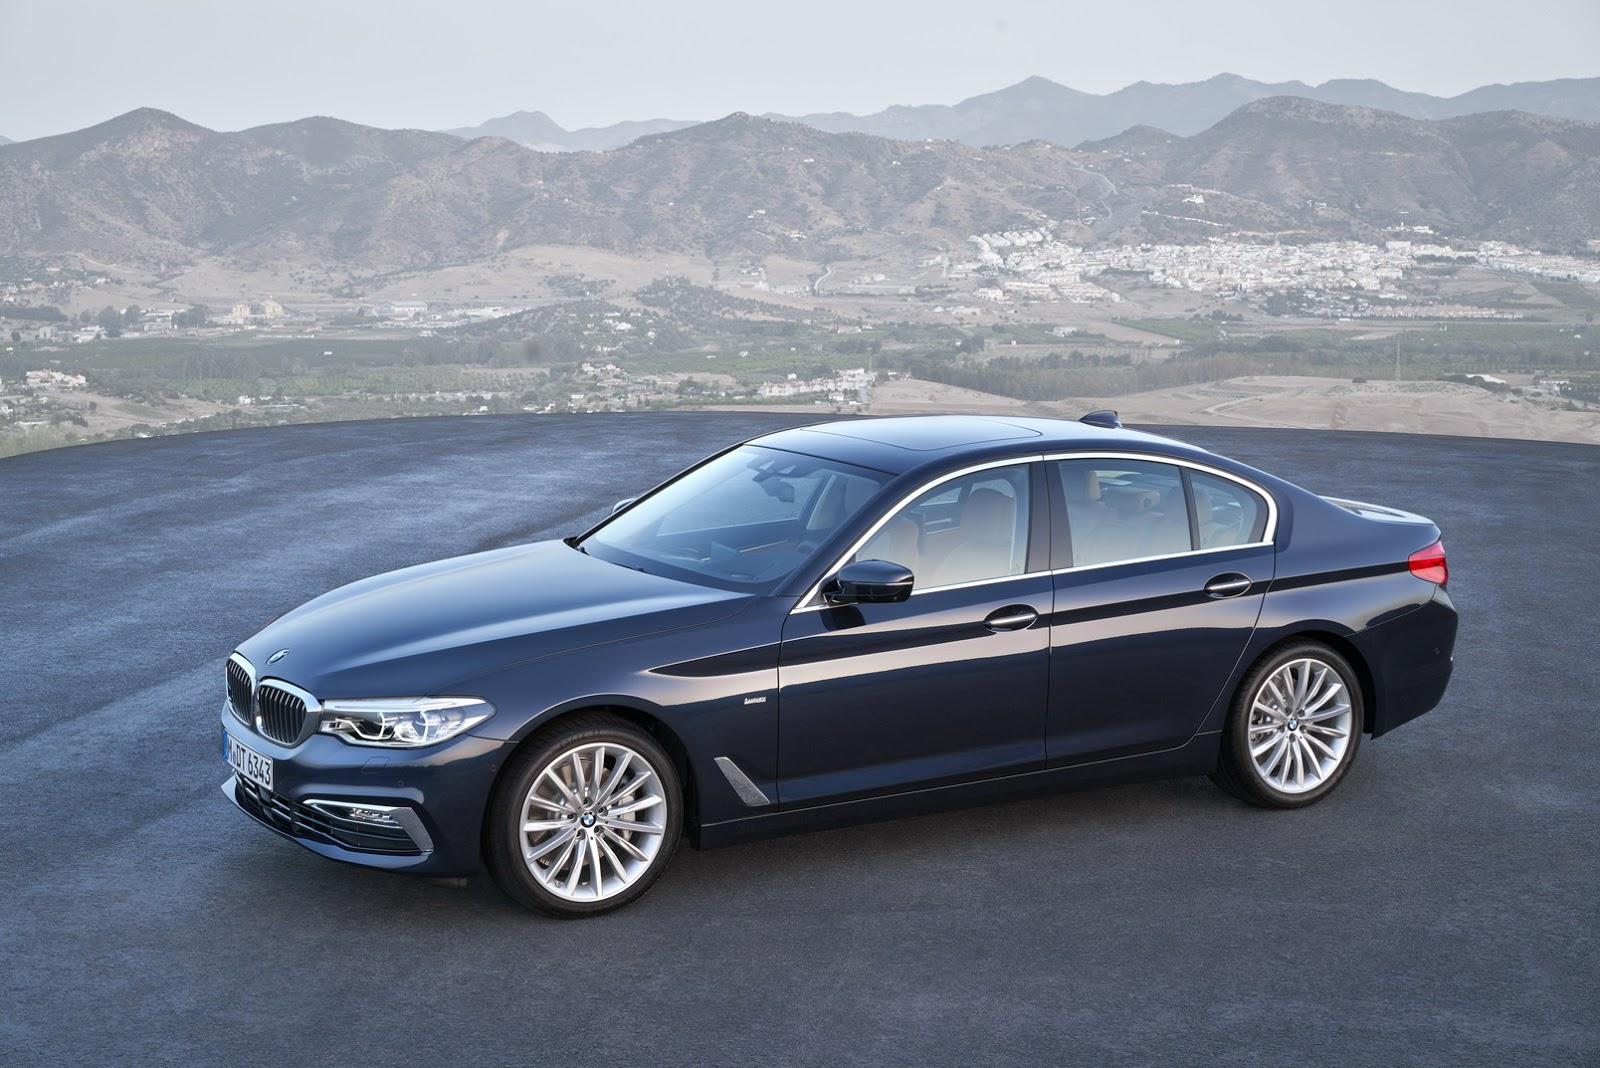 2017-BMW-5-Series-103.jpg